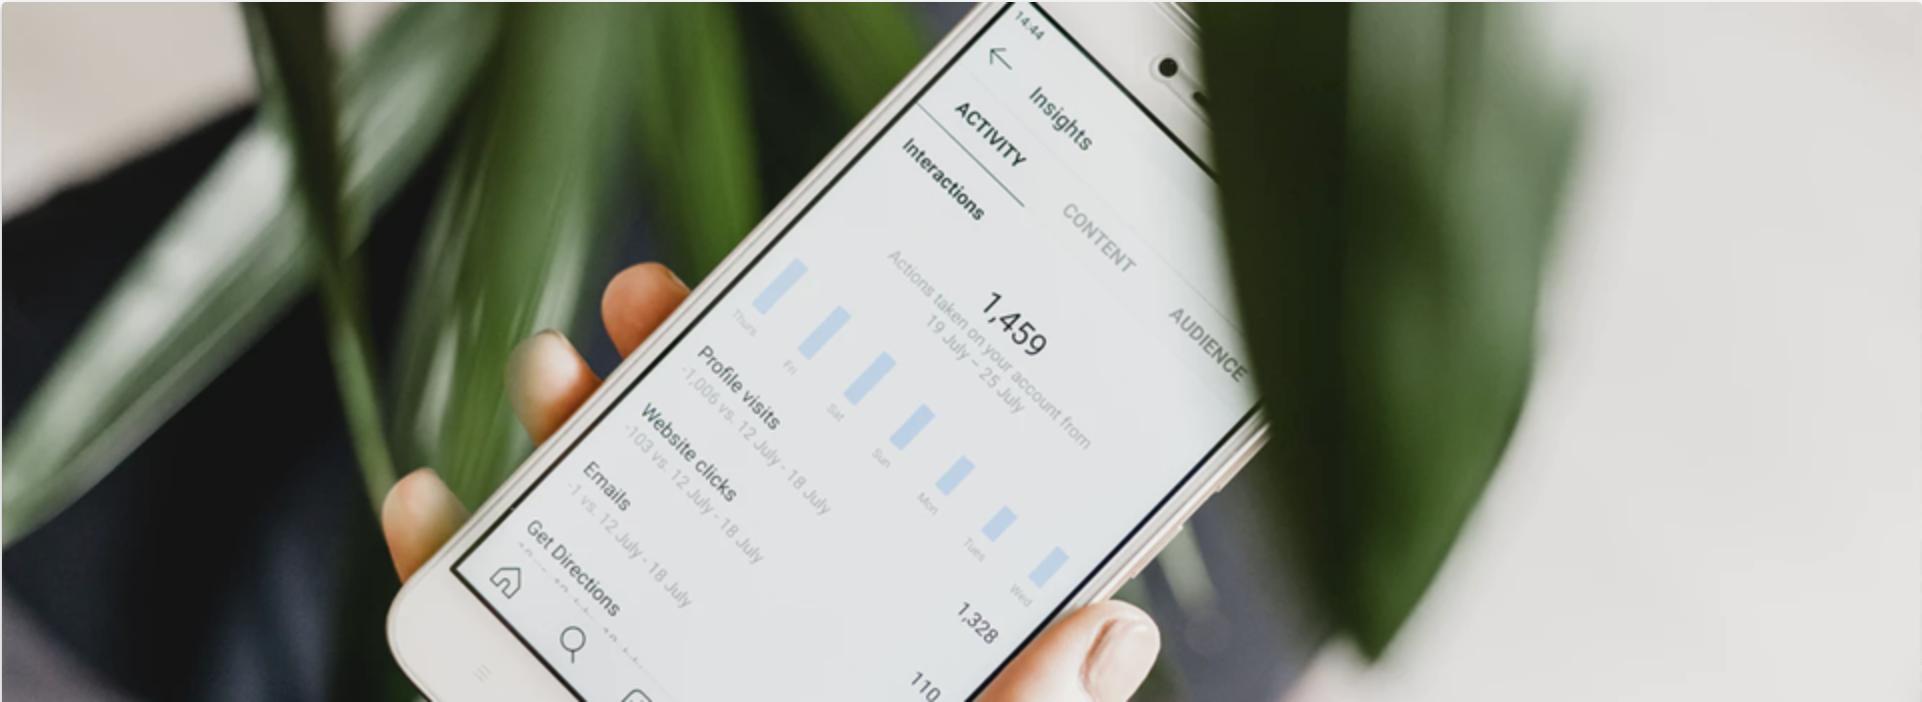 Inzicht Instagram-bedrijfsprofiel